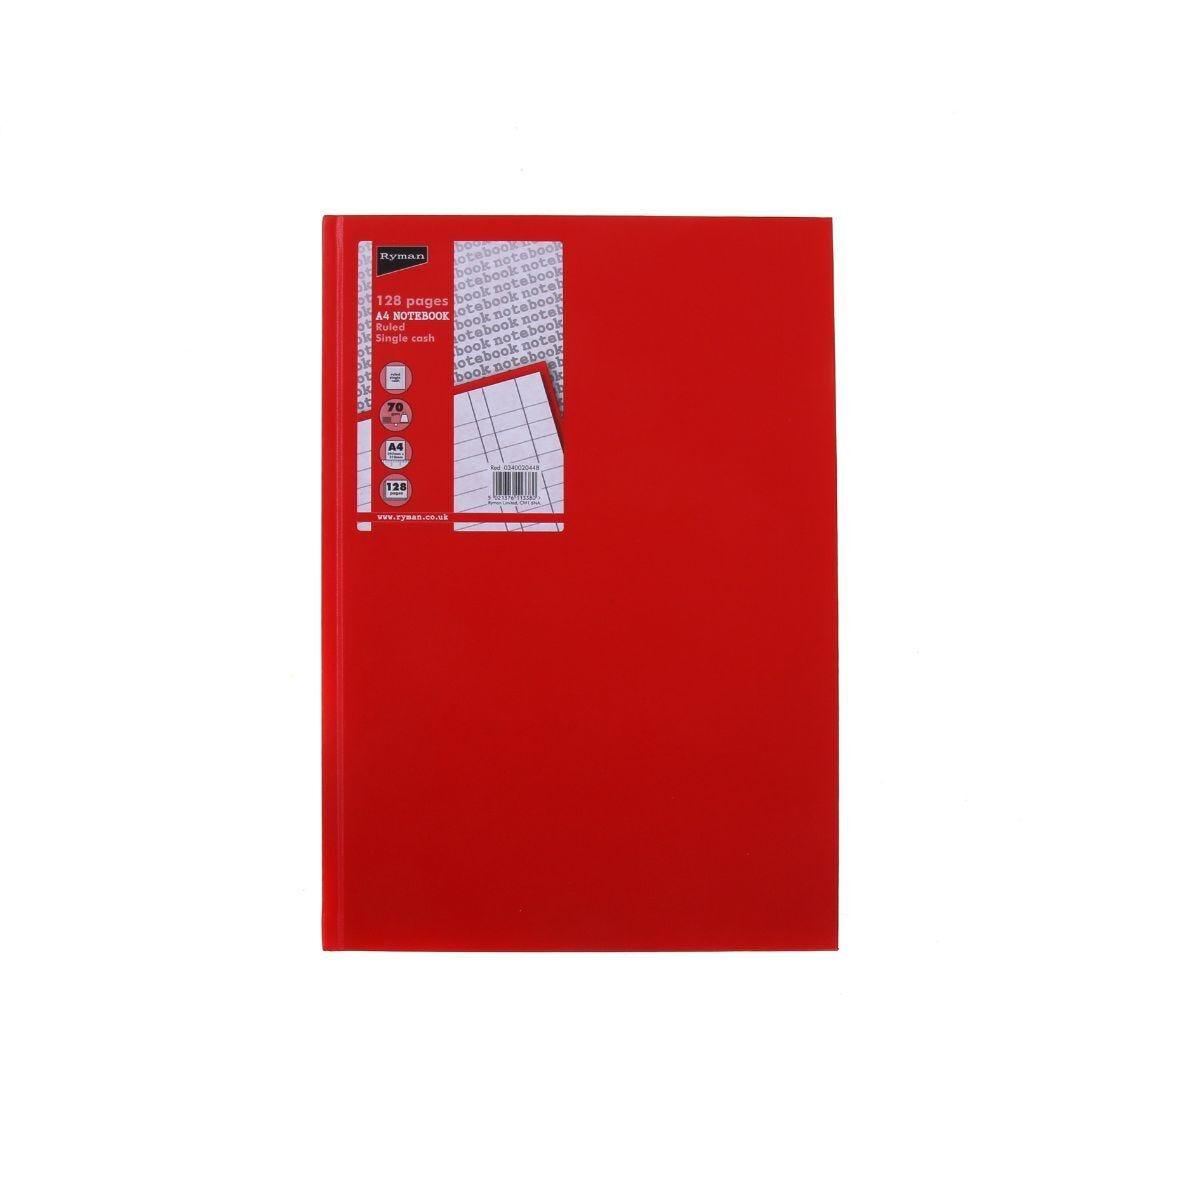 Ryman Case Bound Memo Book Single Cash A4 128 Pages 70gsm